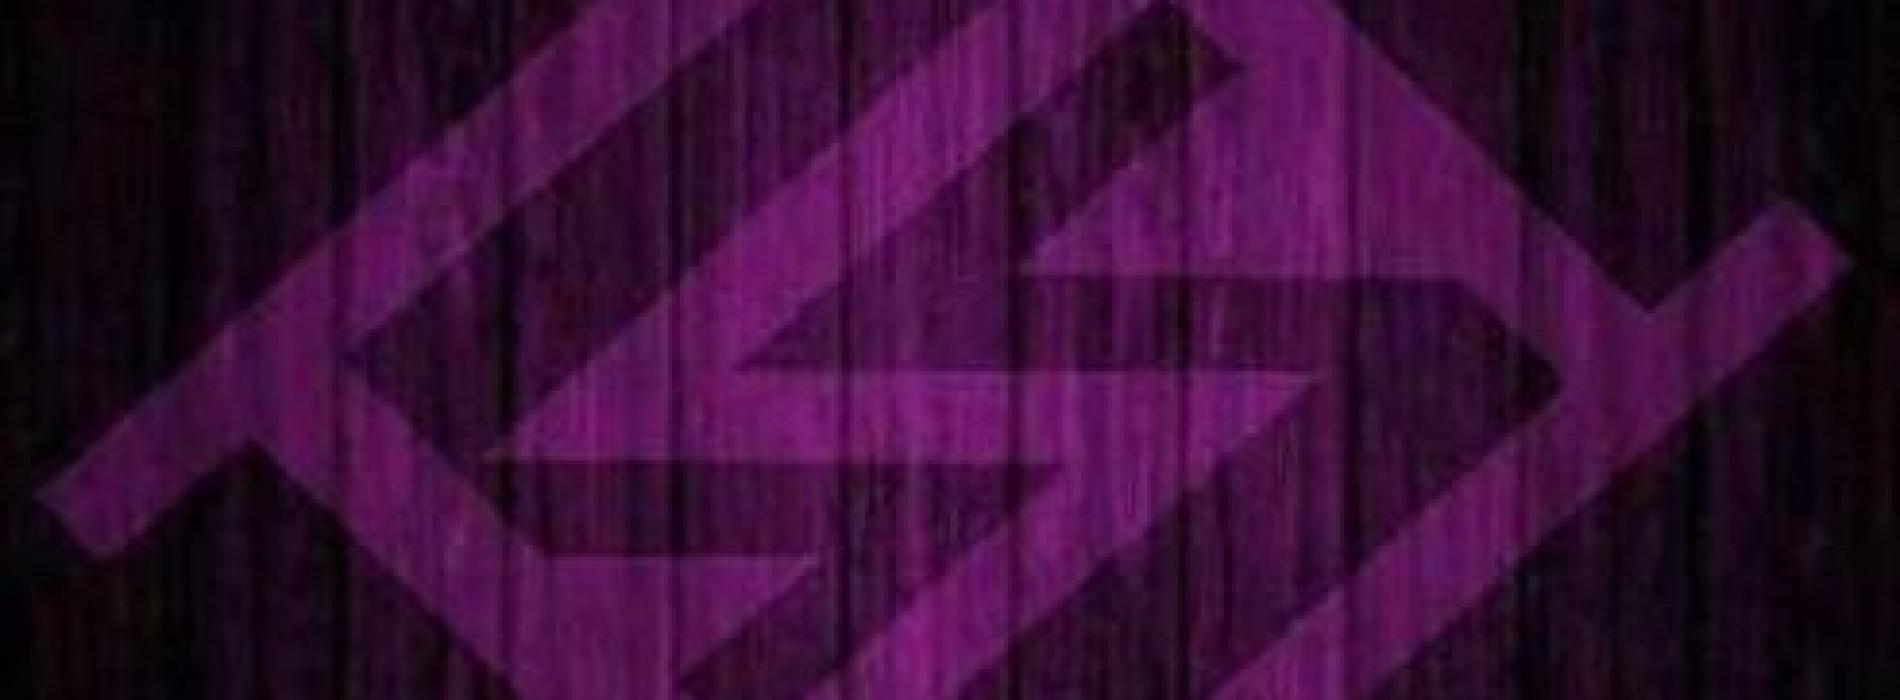 Electro Doctors – Gajaga (SS Brotherz Remix)